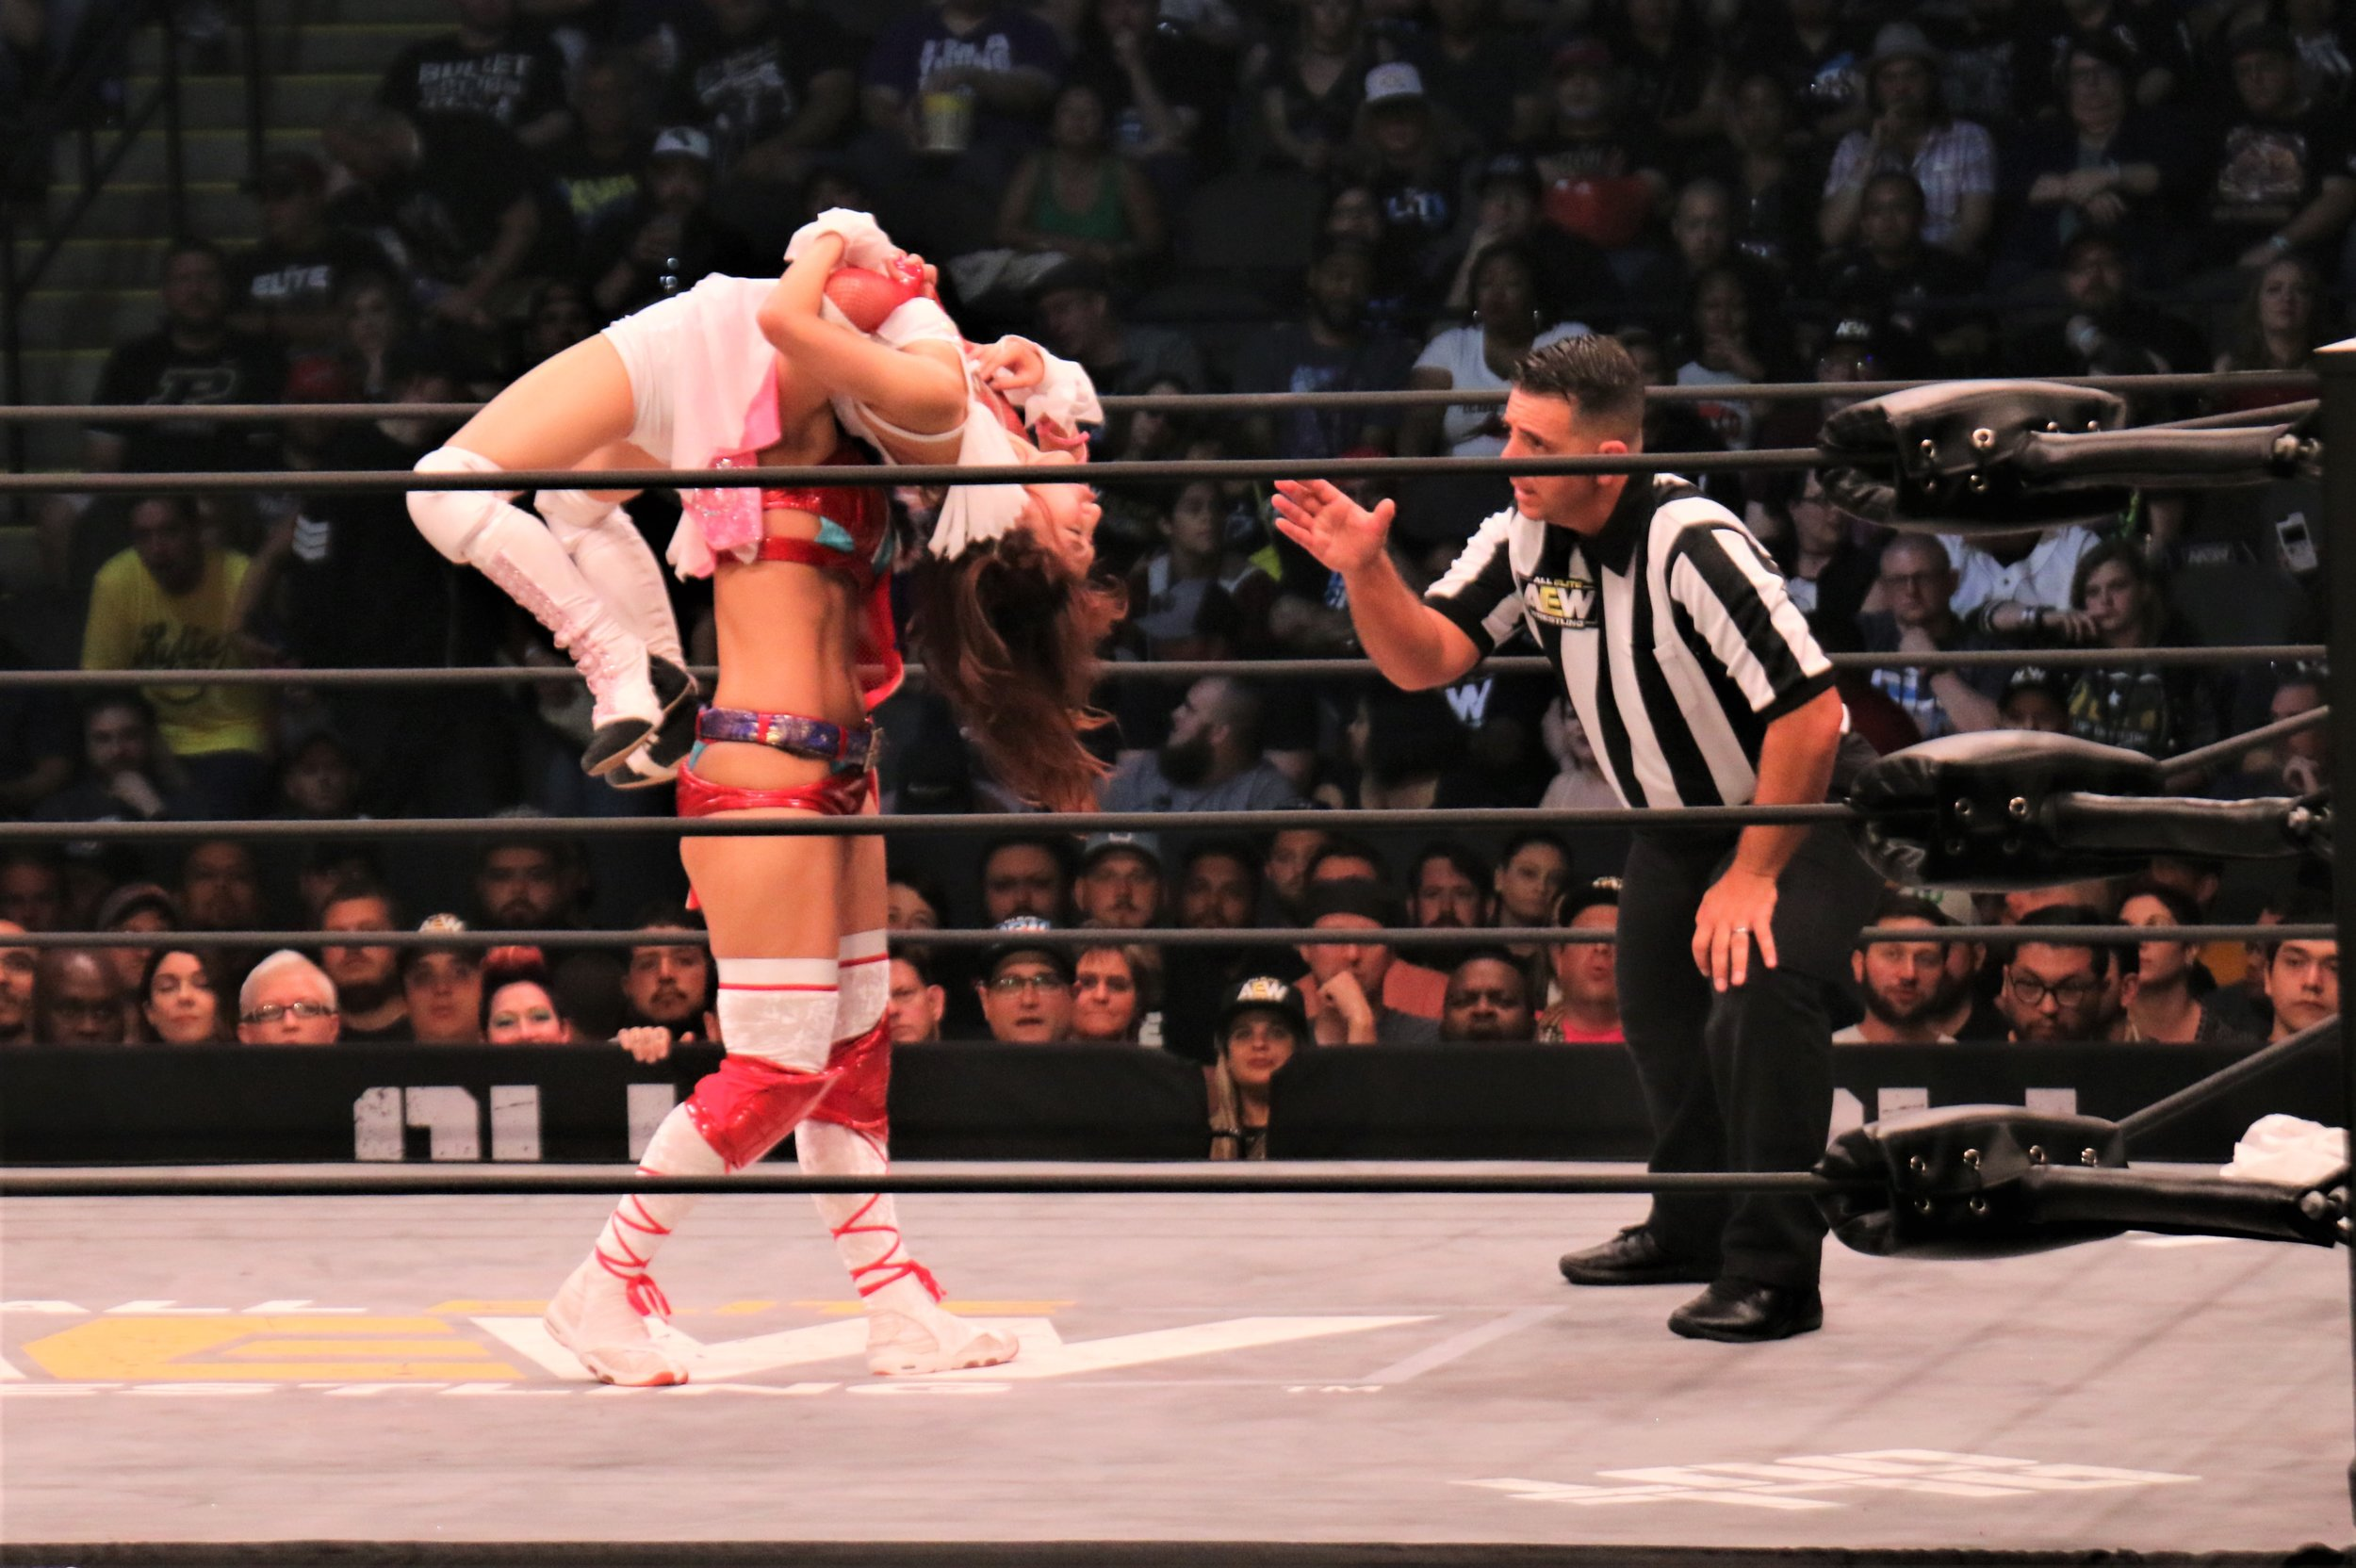 Hikaru Shida puts Riho in a backbreaker submission.